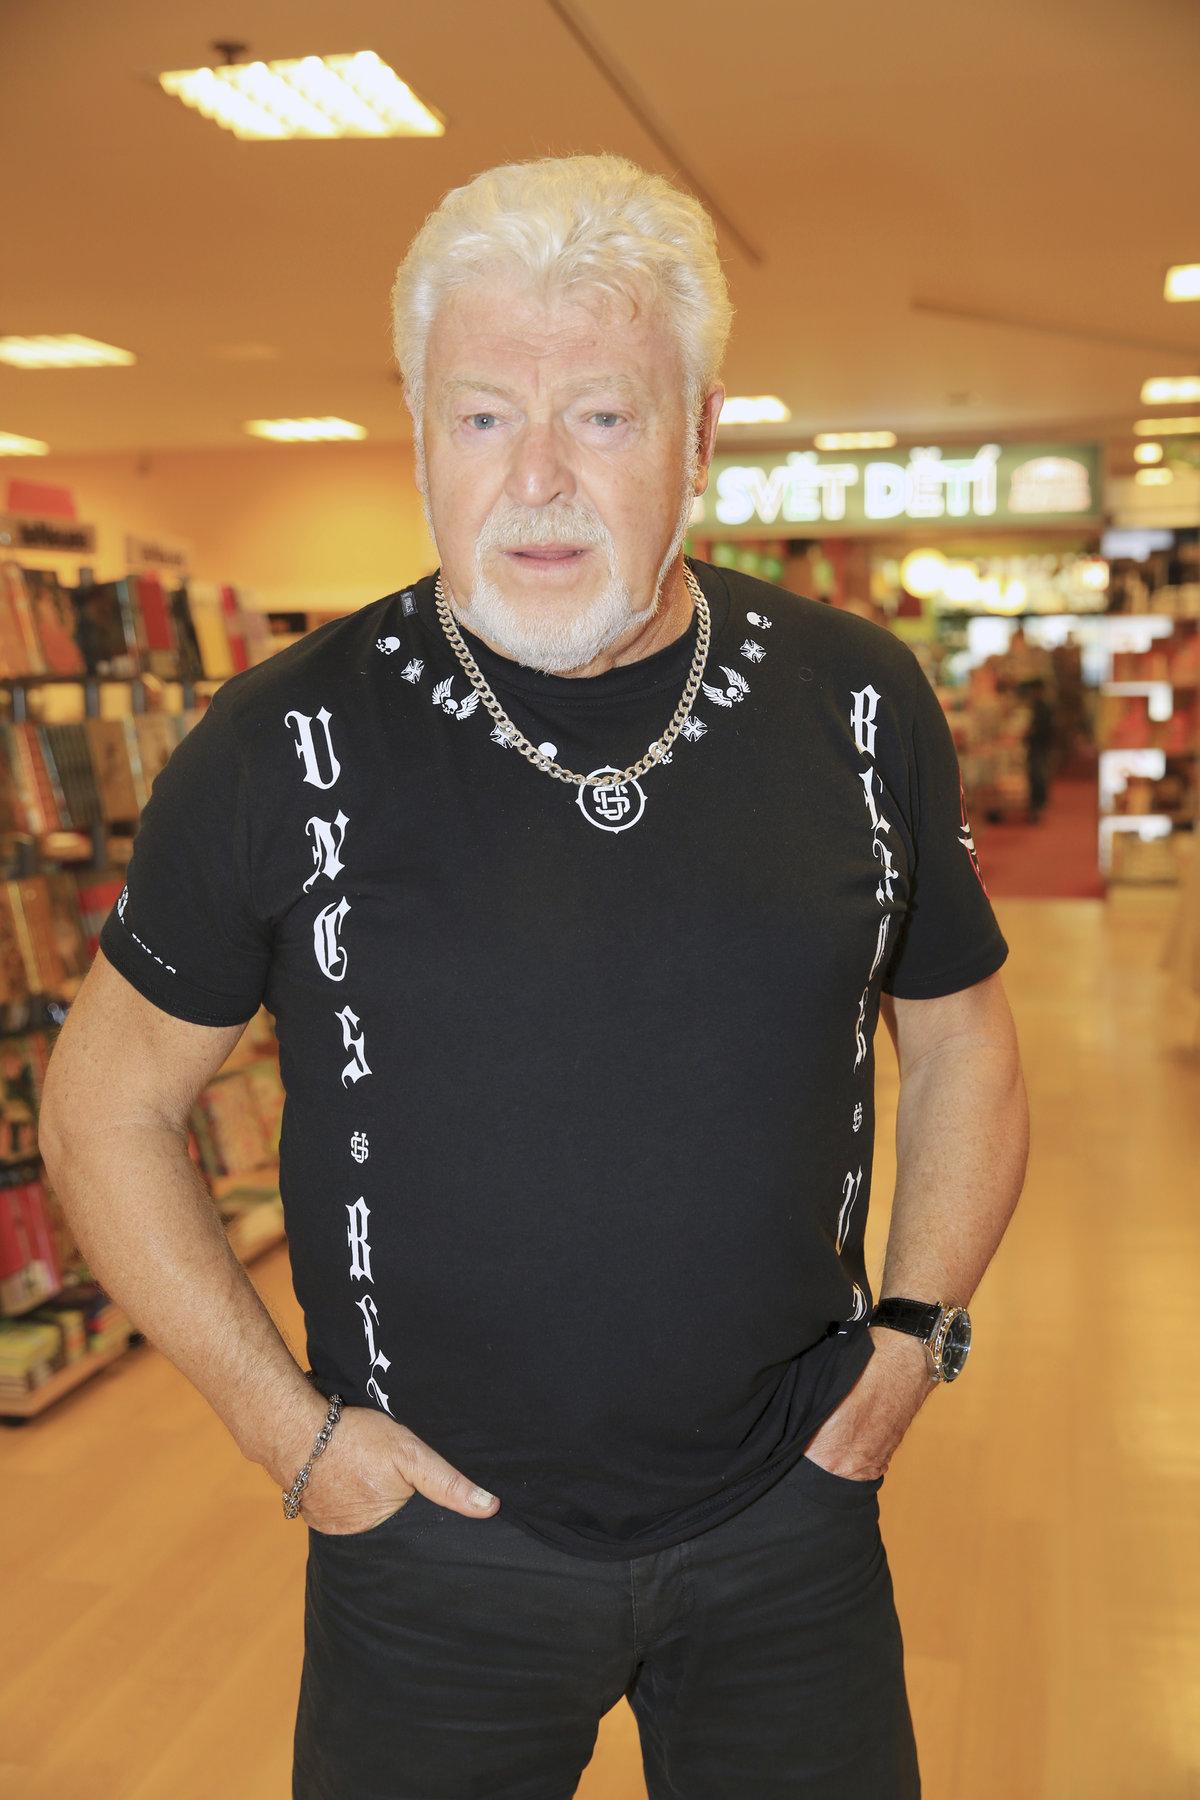 Milan Drobný